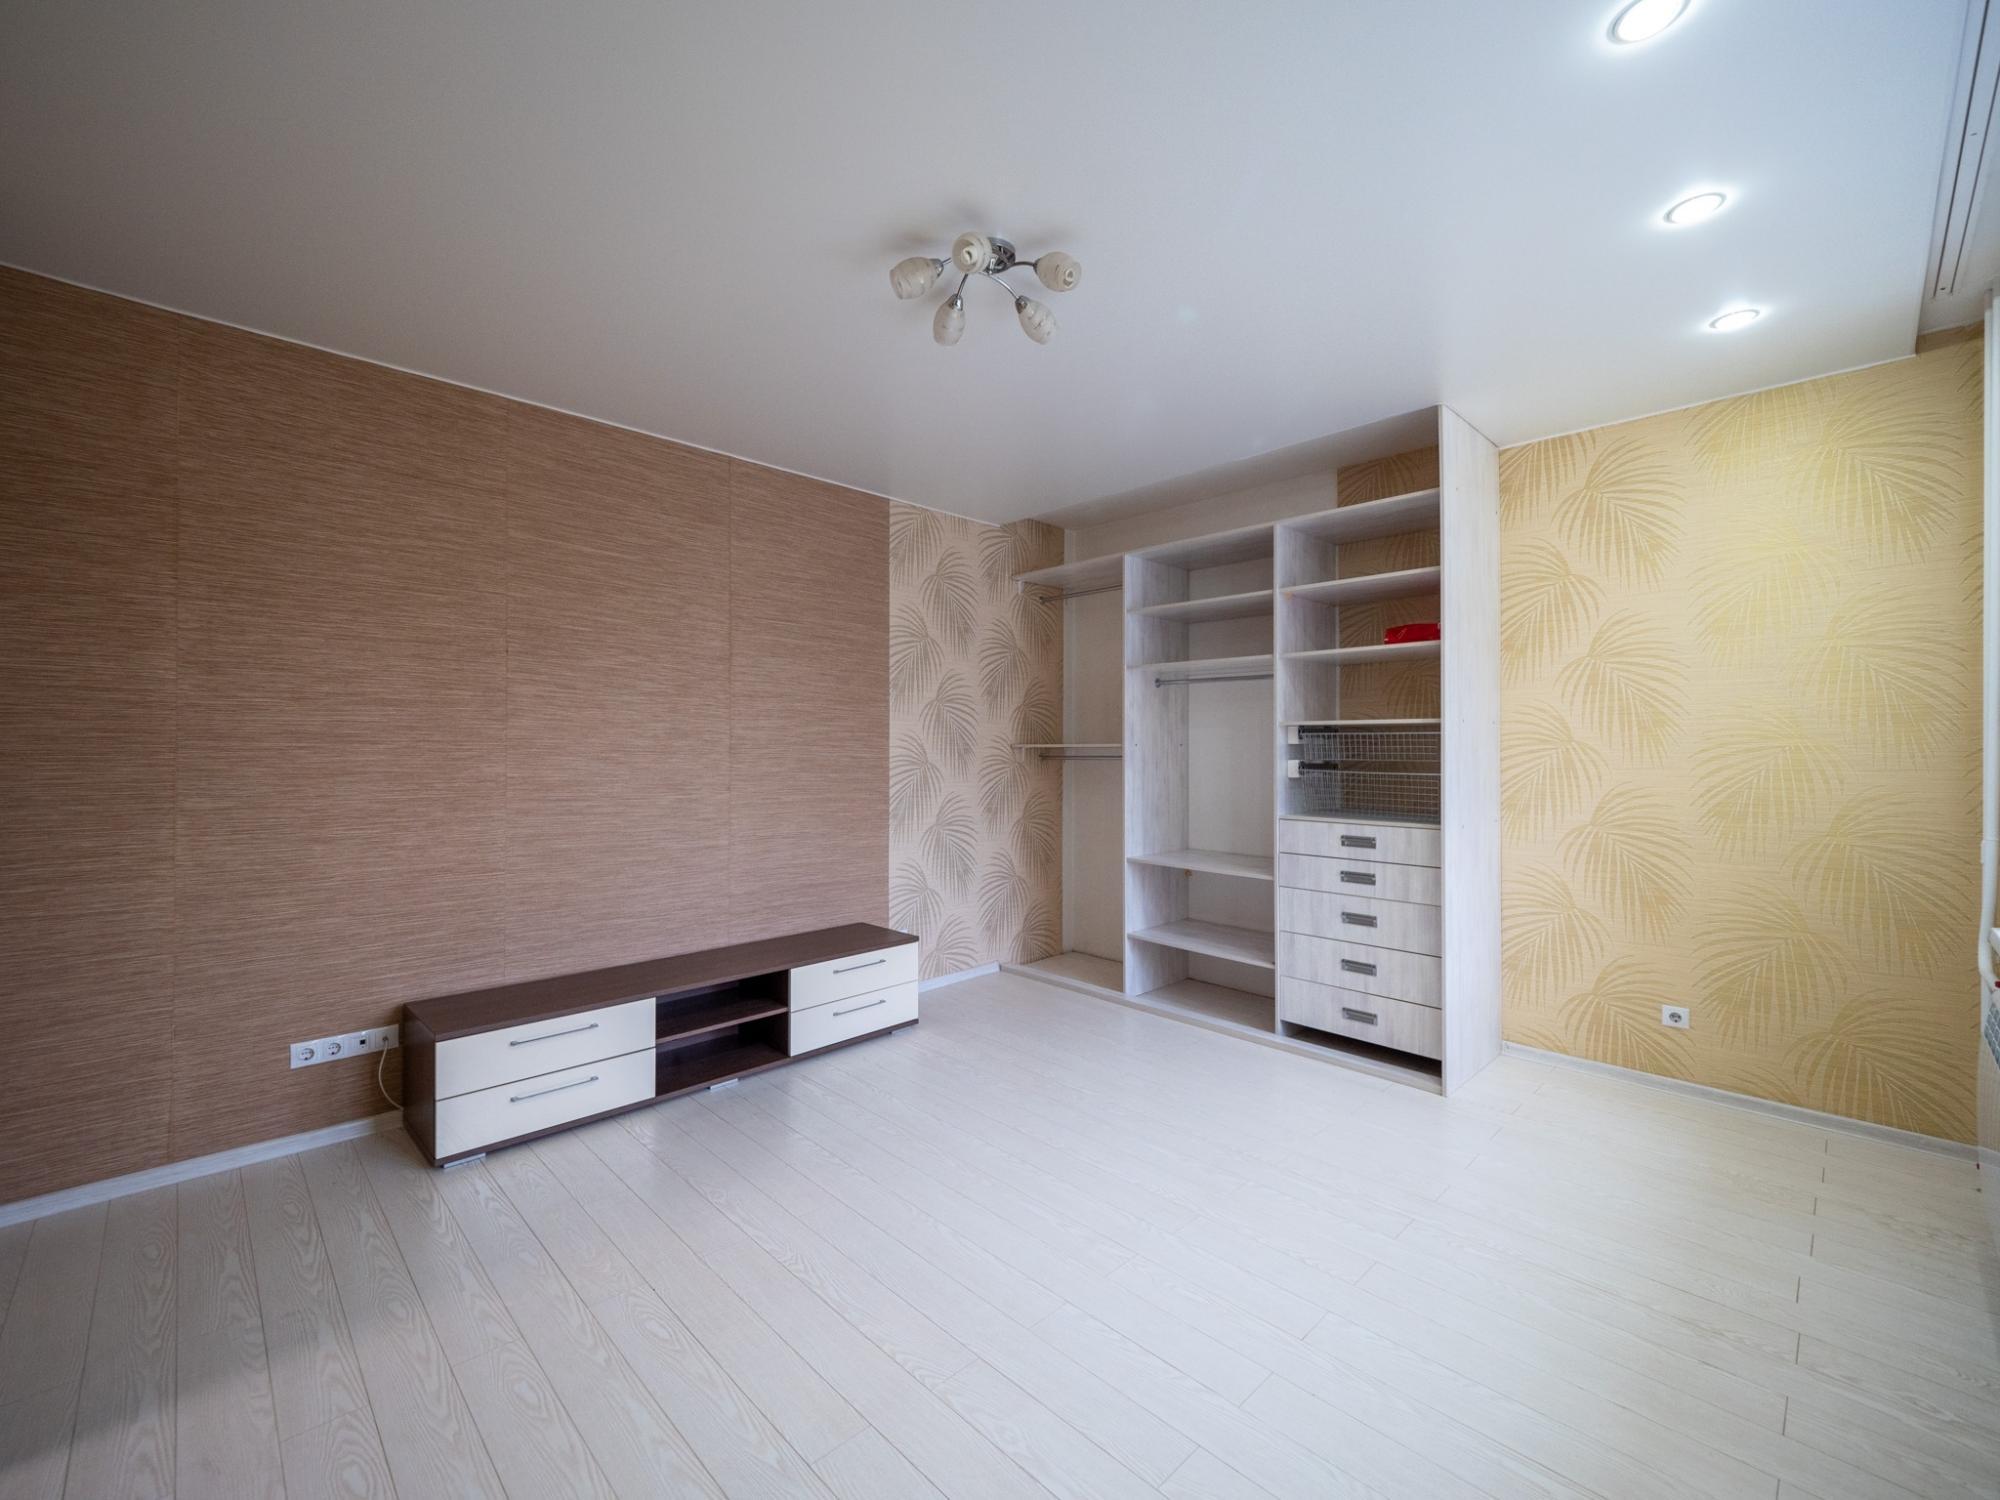 1к квартира улица Весны, 2а | 21000 | аренда в Красноярске фото 2